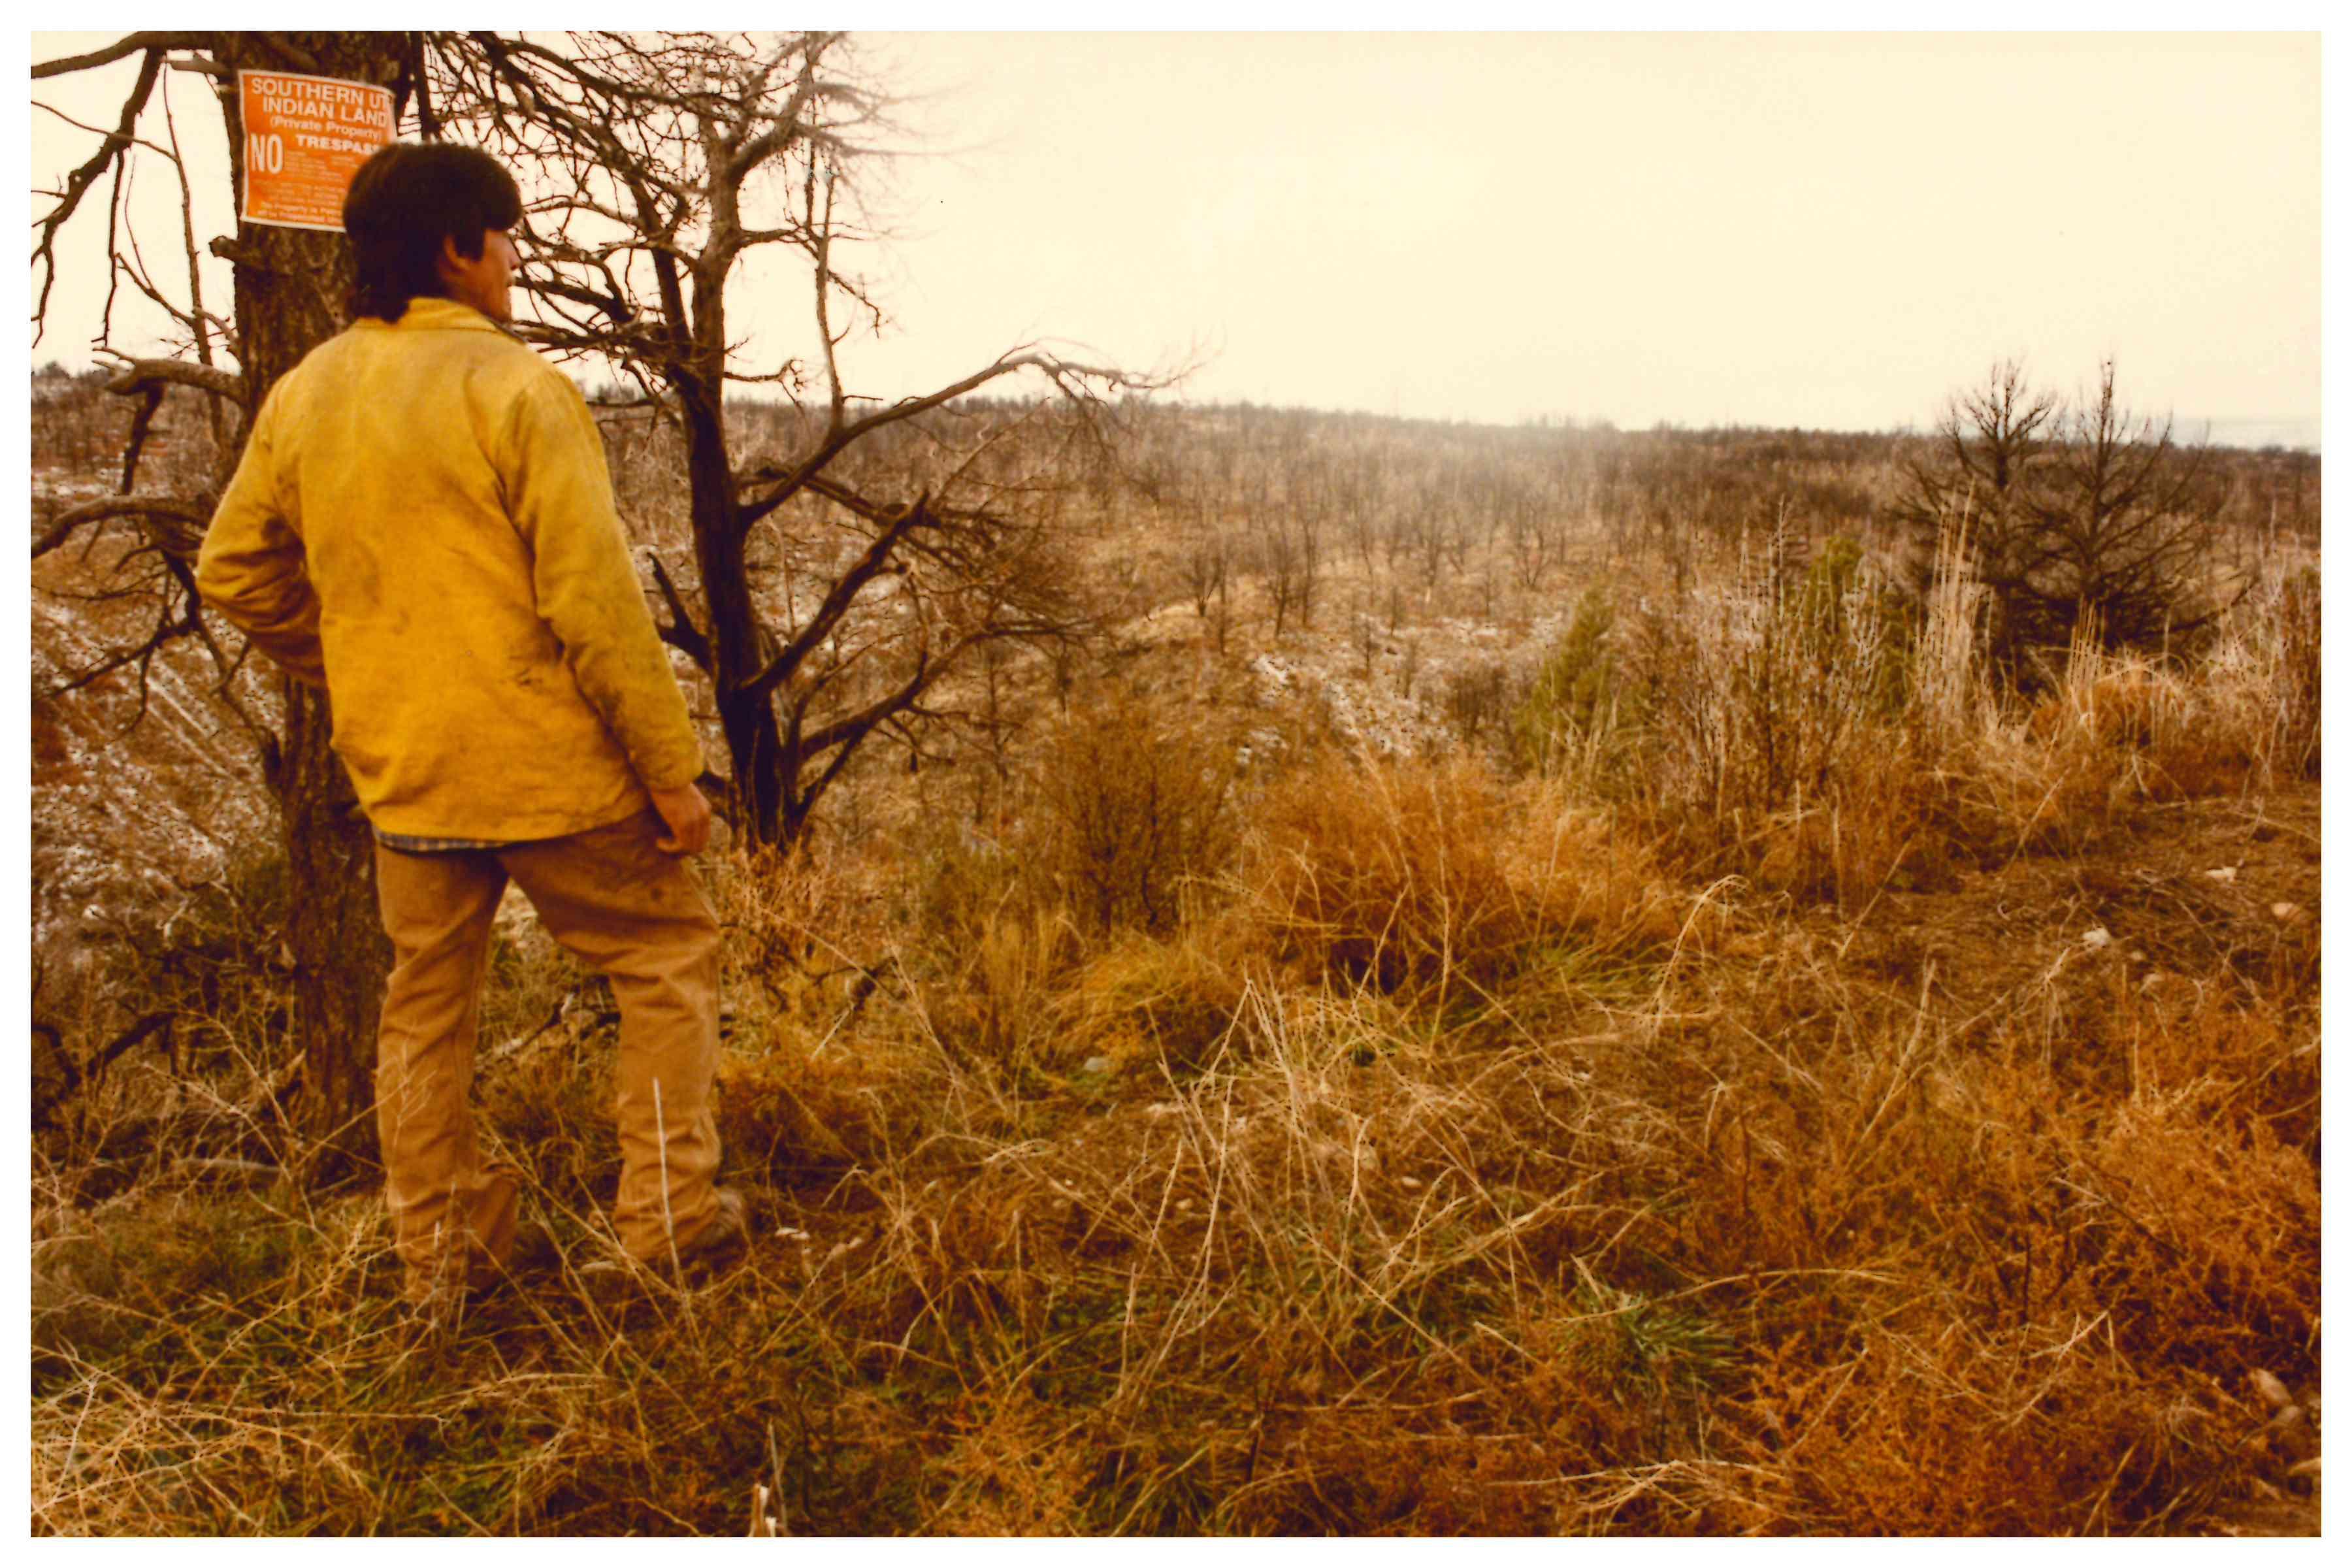 Ute man staring into a barren field